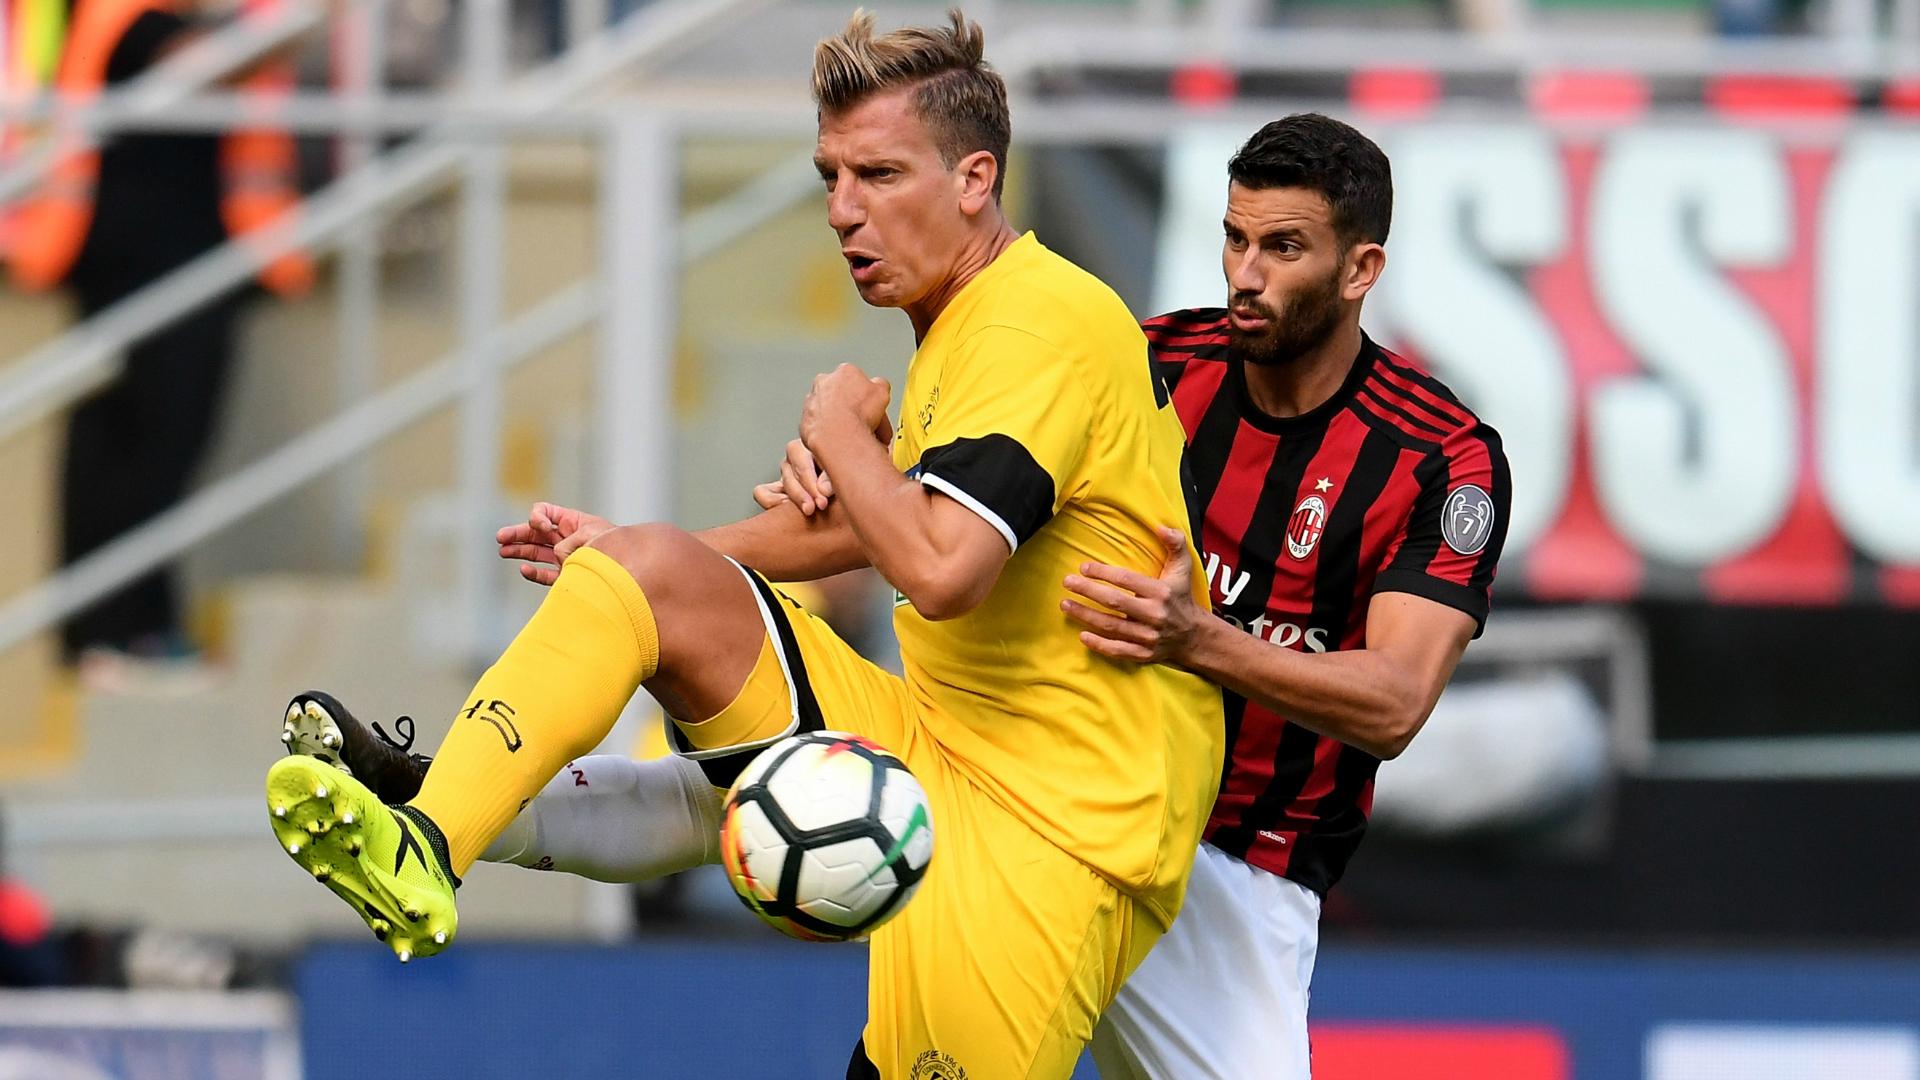 Maxi Lopez Musacchio Milan Udinese Serie A